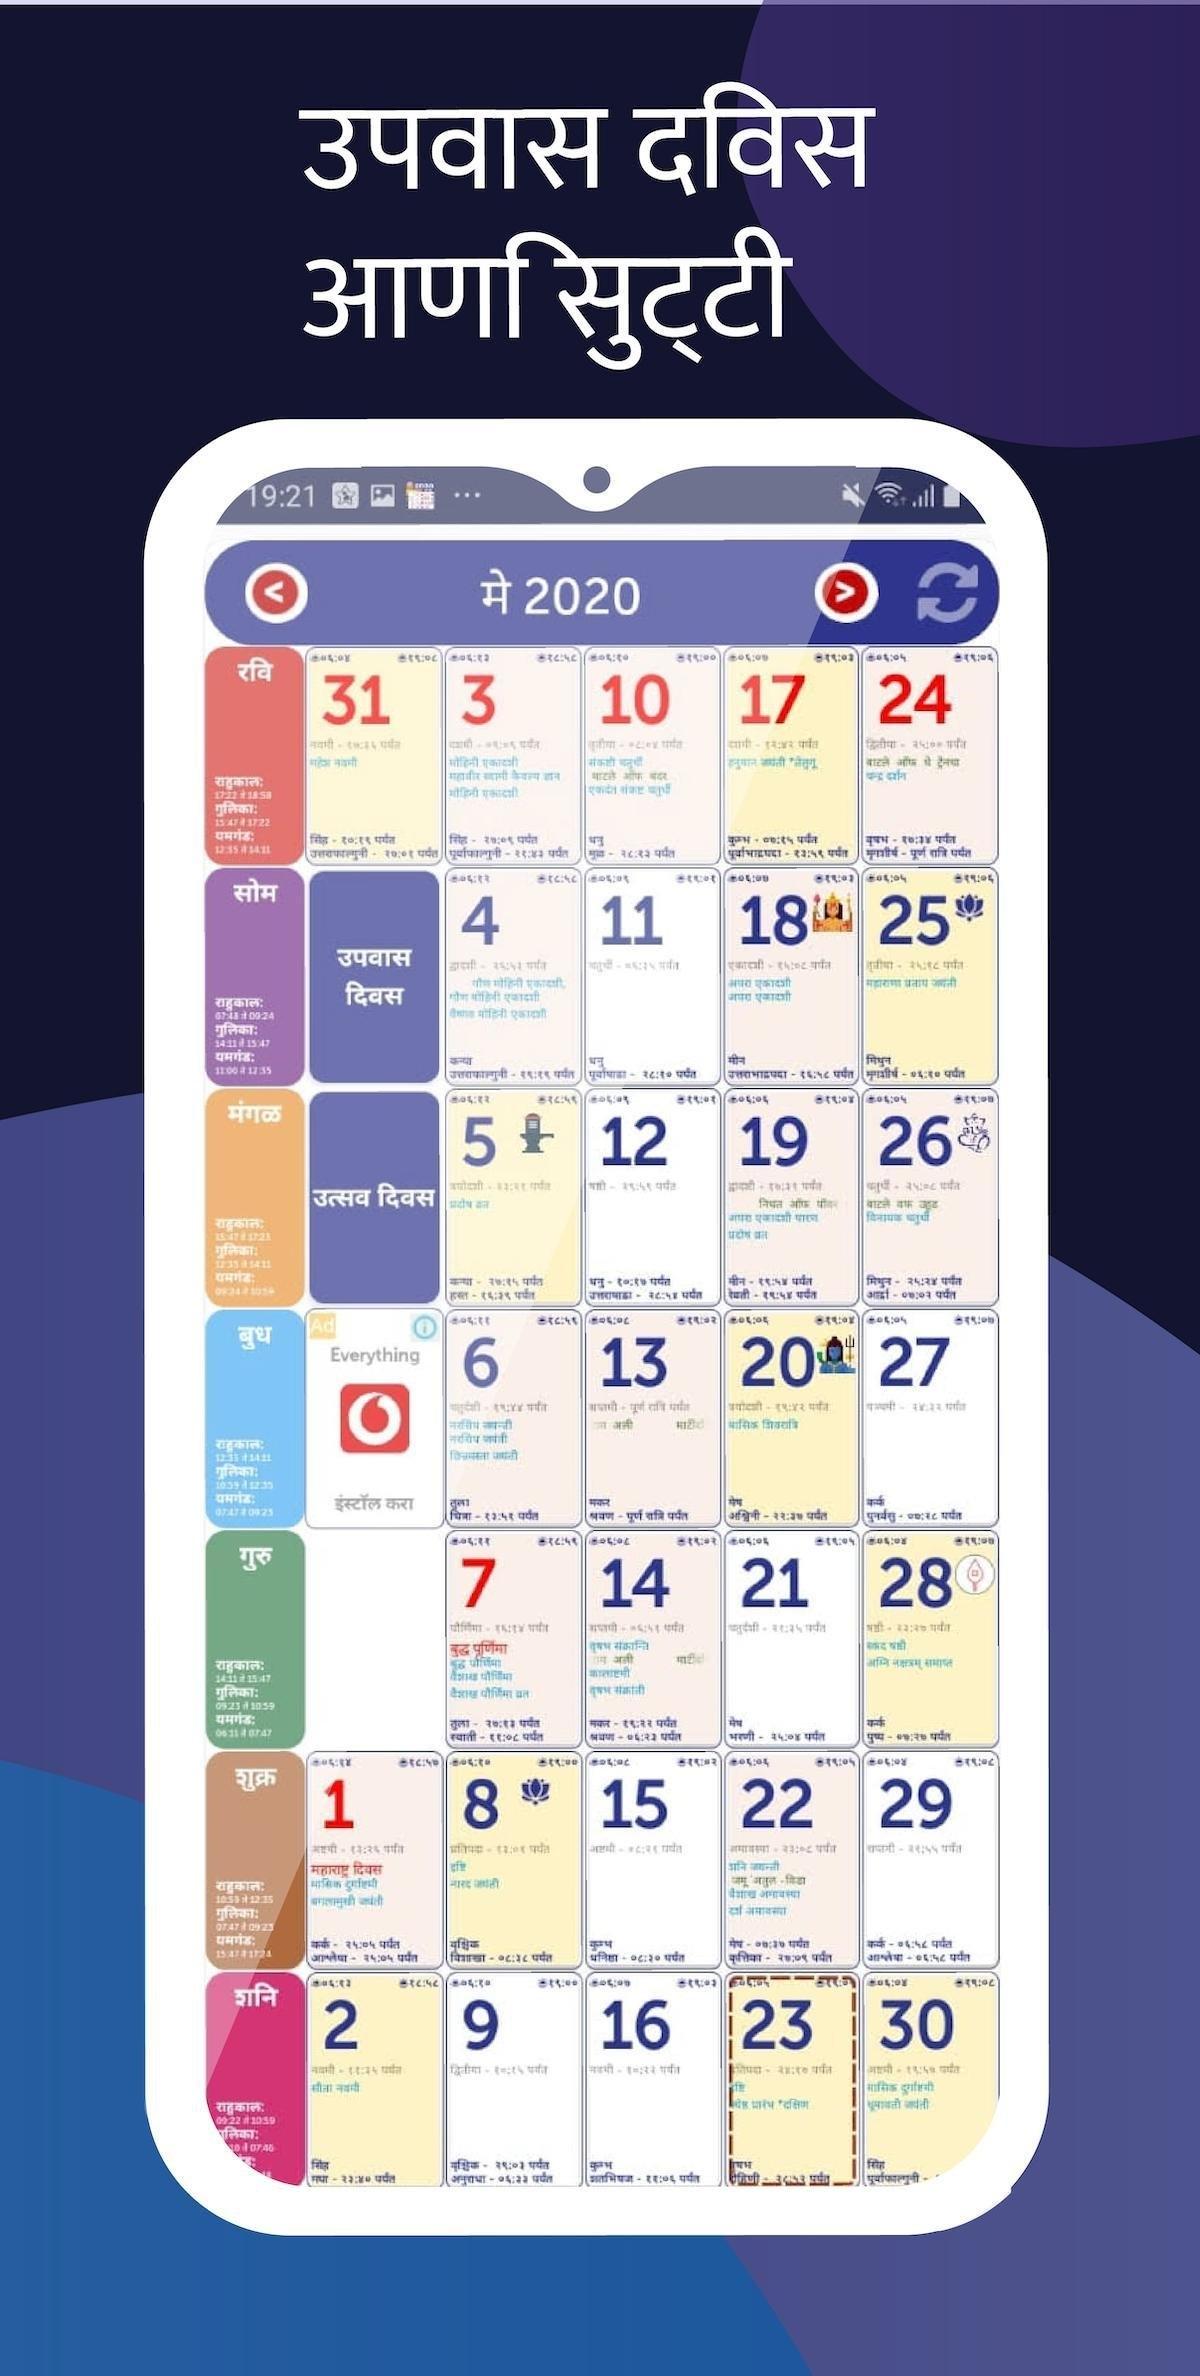 Marathi Calendar 2021 - मराठी कॅलेंडर 2021 For Android - Apk Download in Marathi Calender July 2021 Image Image